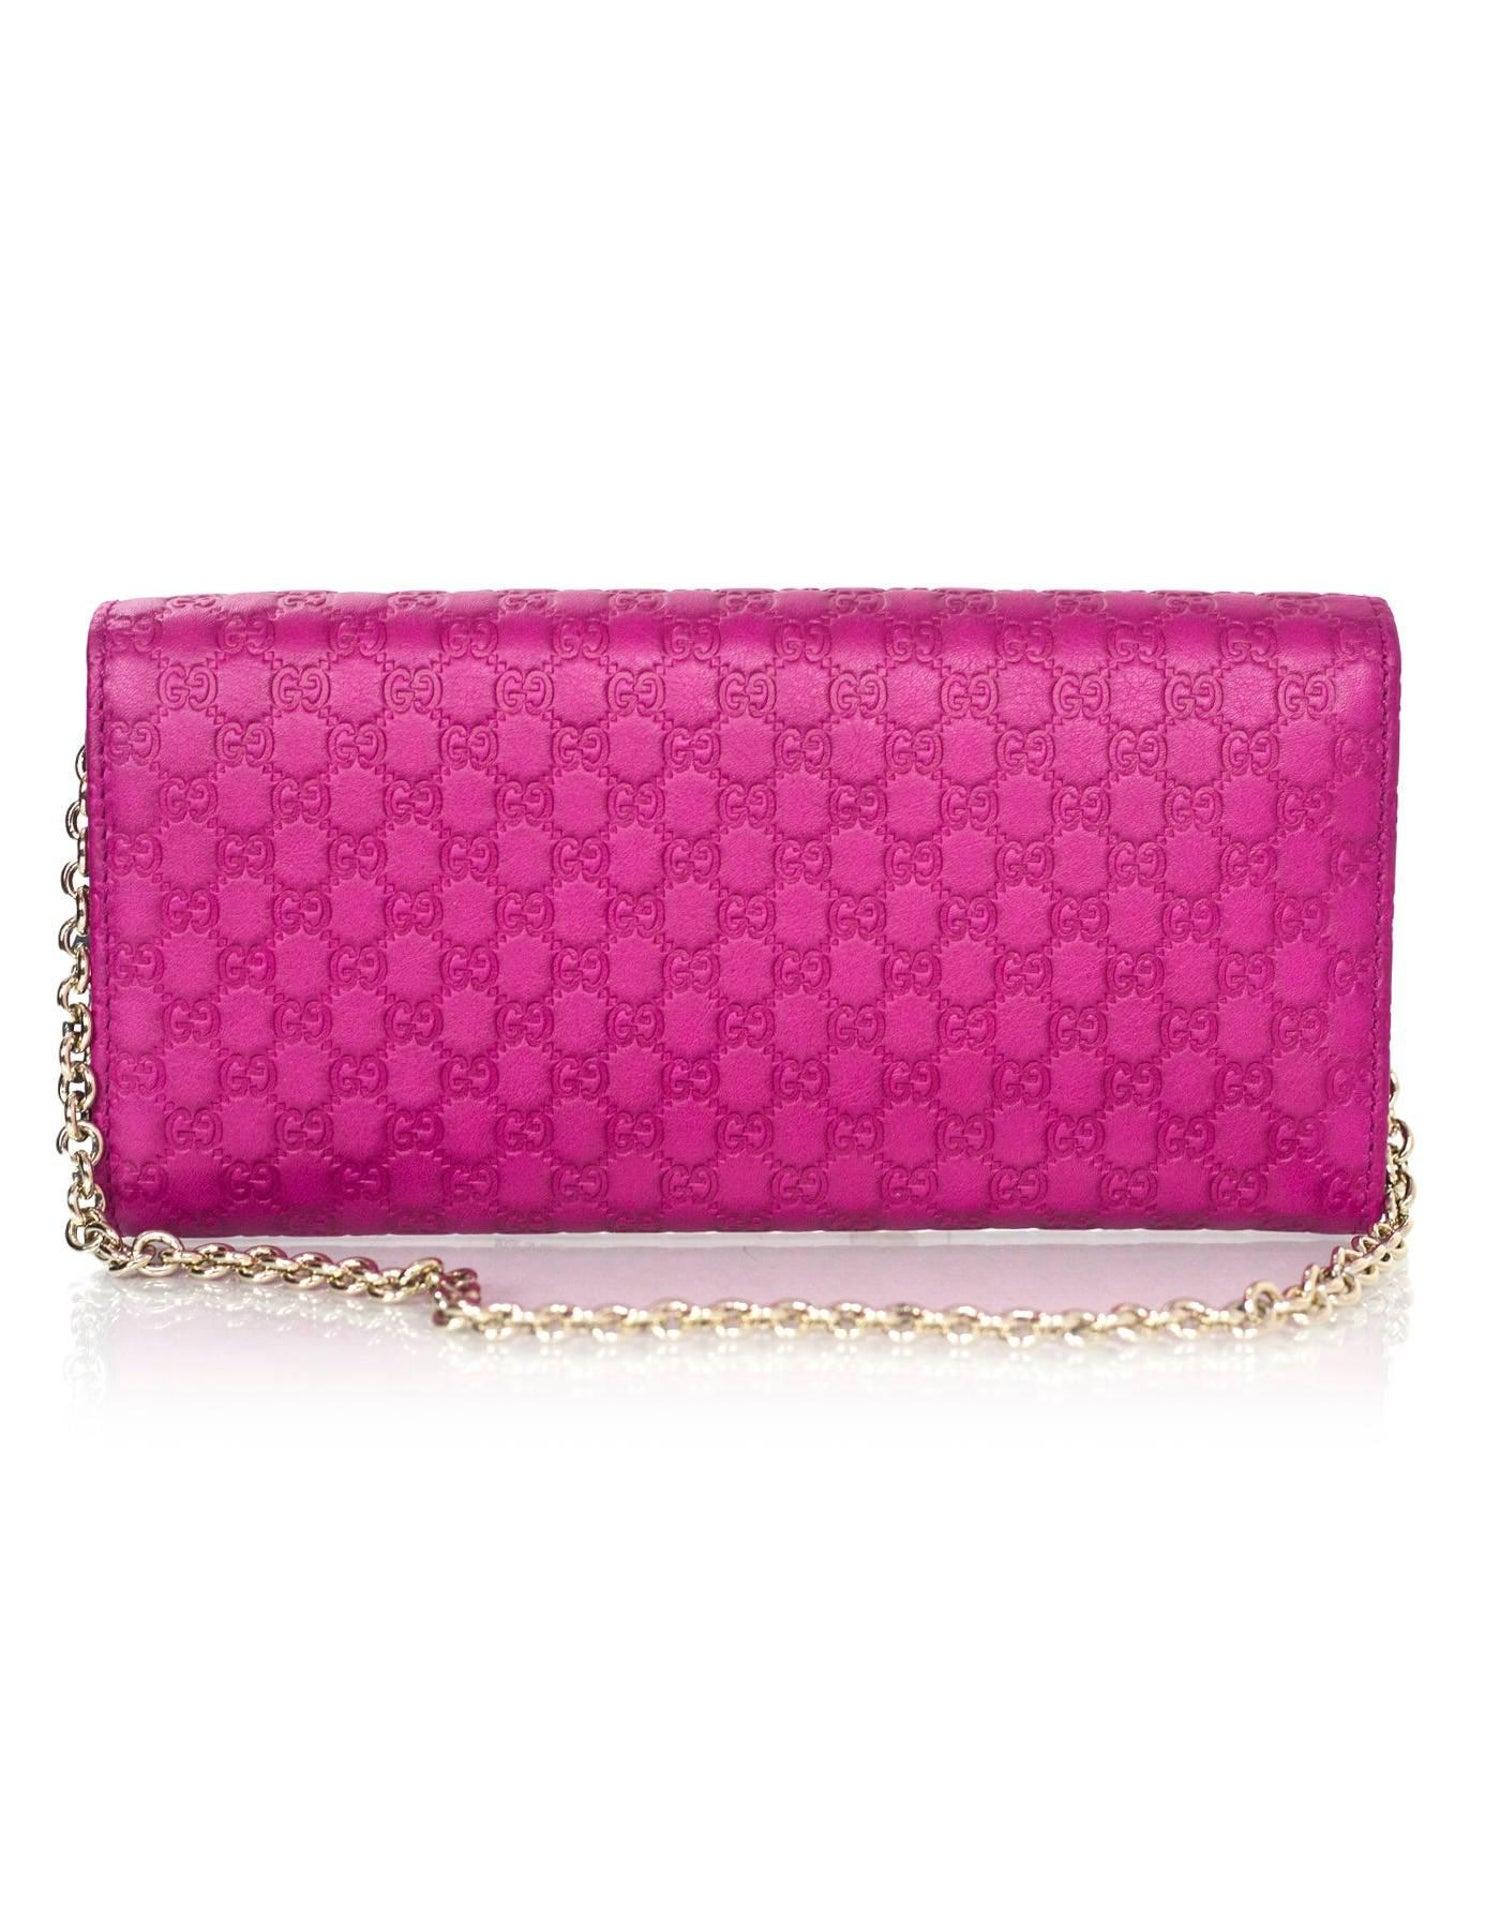 2d98e74aa0fa42 Gucci Fuschia Dice Microguccissima Leather Chain Wallet NIB For Sale at  1stdibs